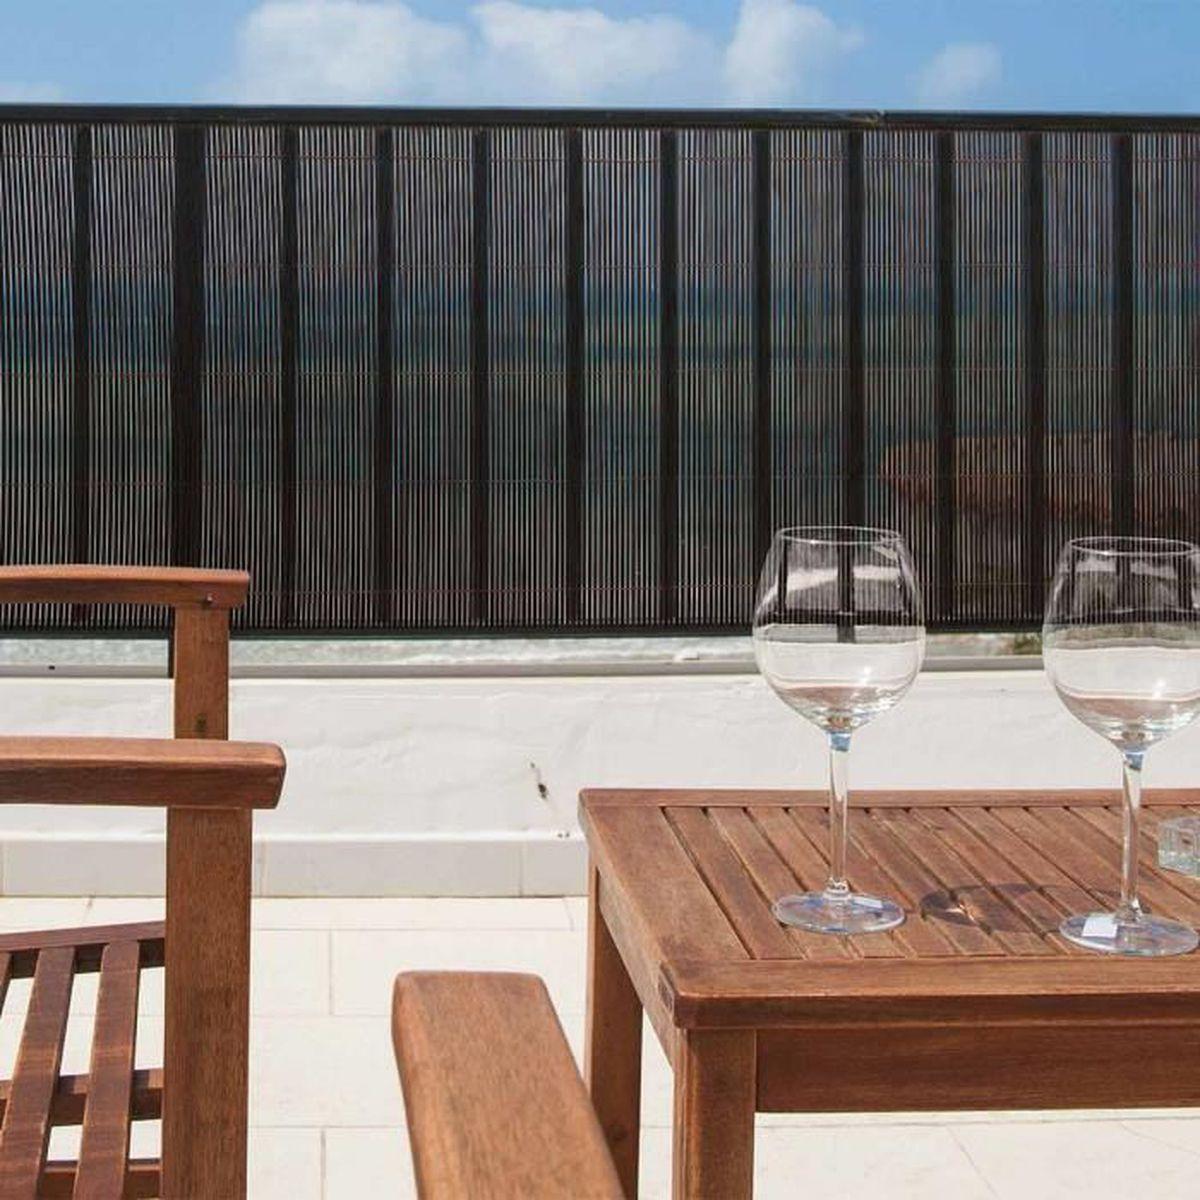 brise vue exel willow osier synth tique 1 x 3 m marron. Black Bedroom Furniture Sets. Home Design Ideas